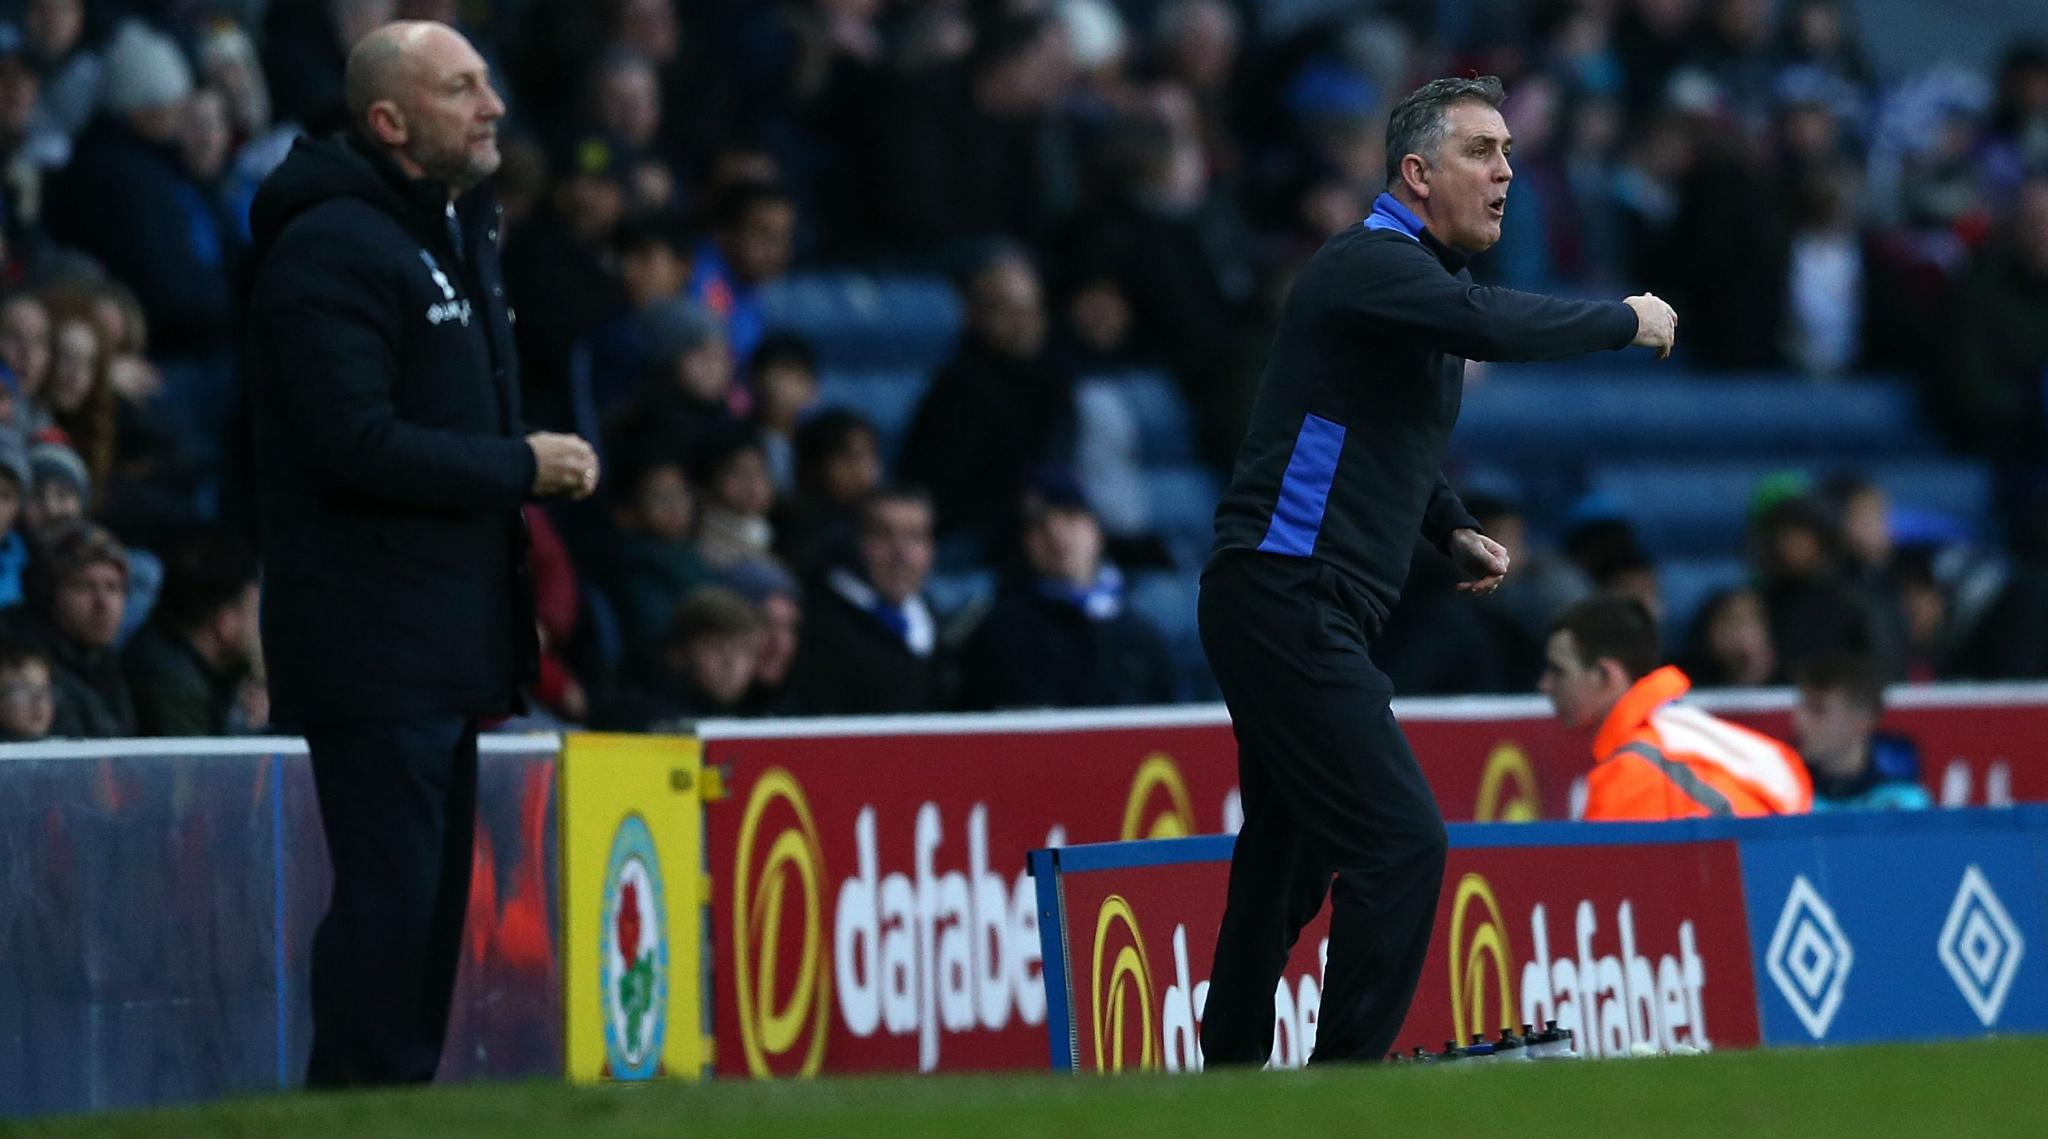 Chennaiyin FC Appoints Former Burnley Manager Owen Coyle as New Head Coach Till End of ISL Season 6